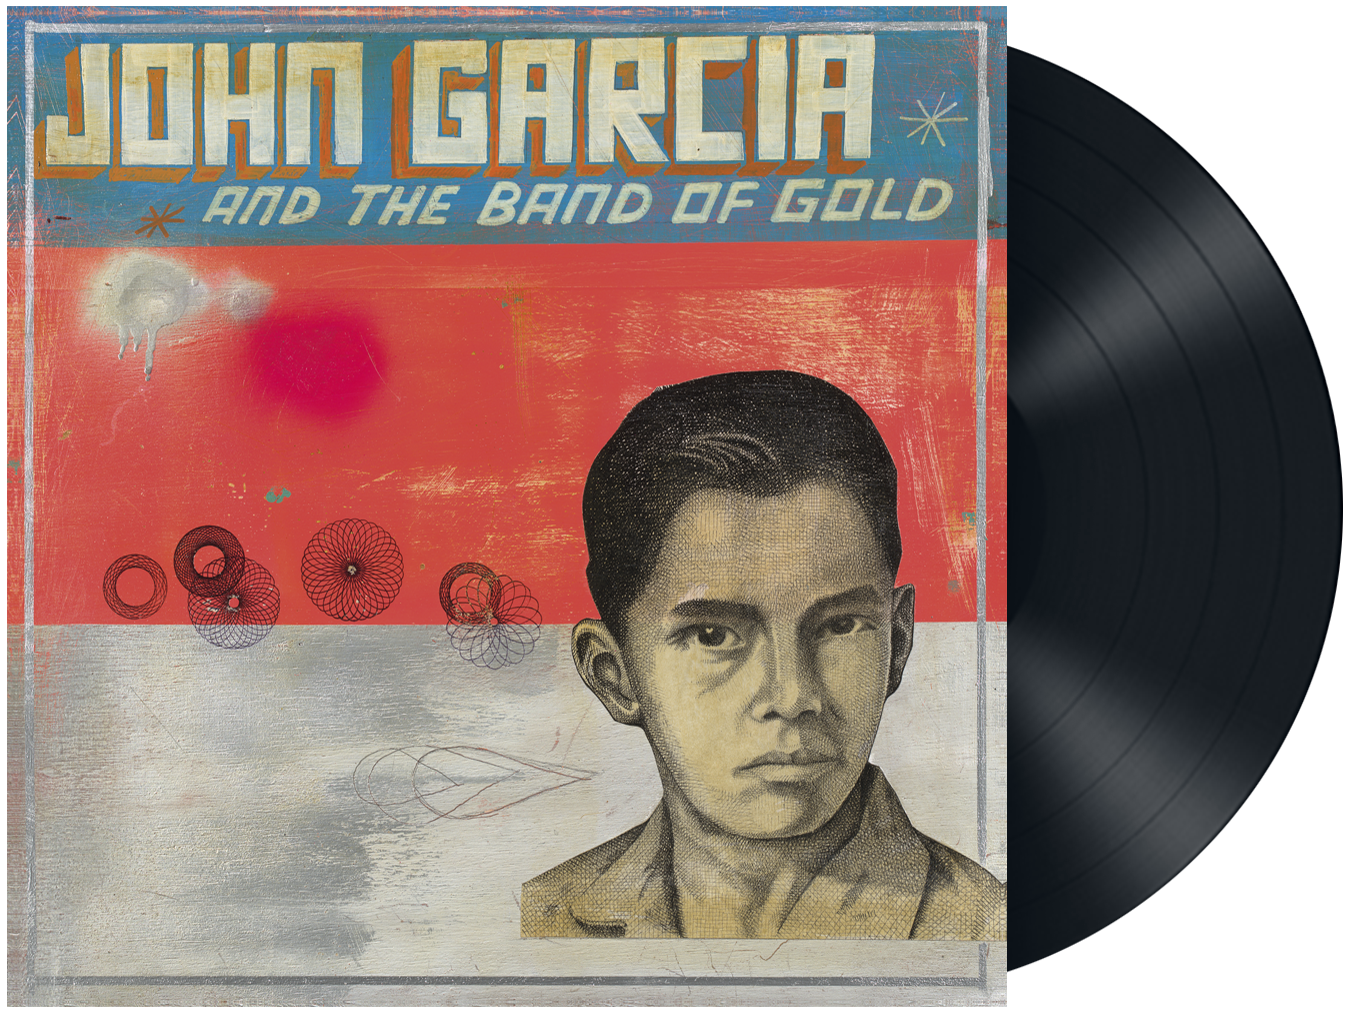 John Garcia - John Garcia and the band of gold - LP - standard